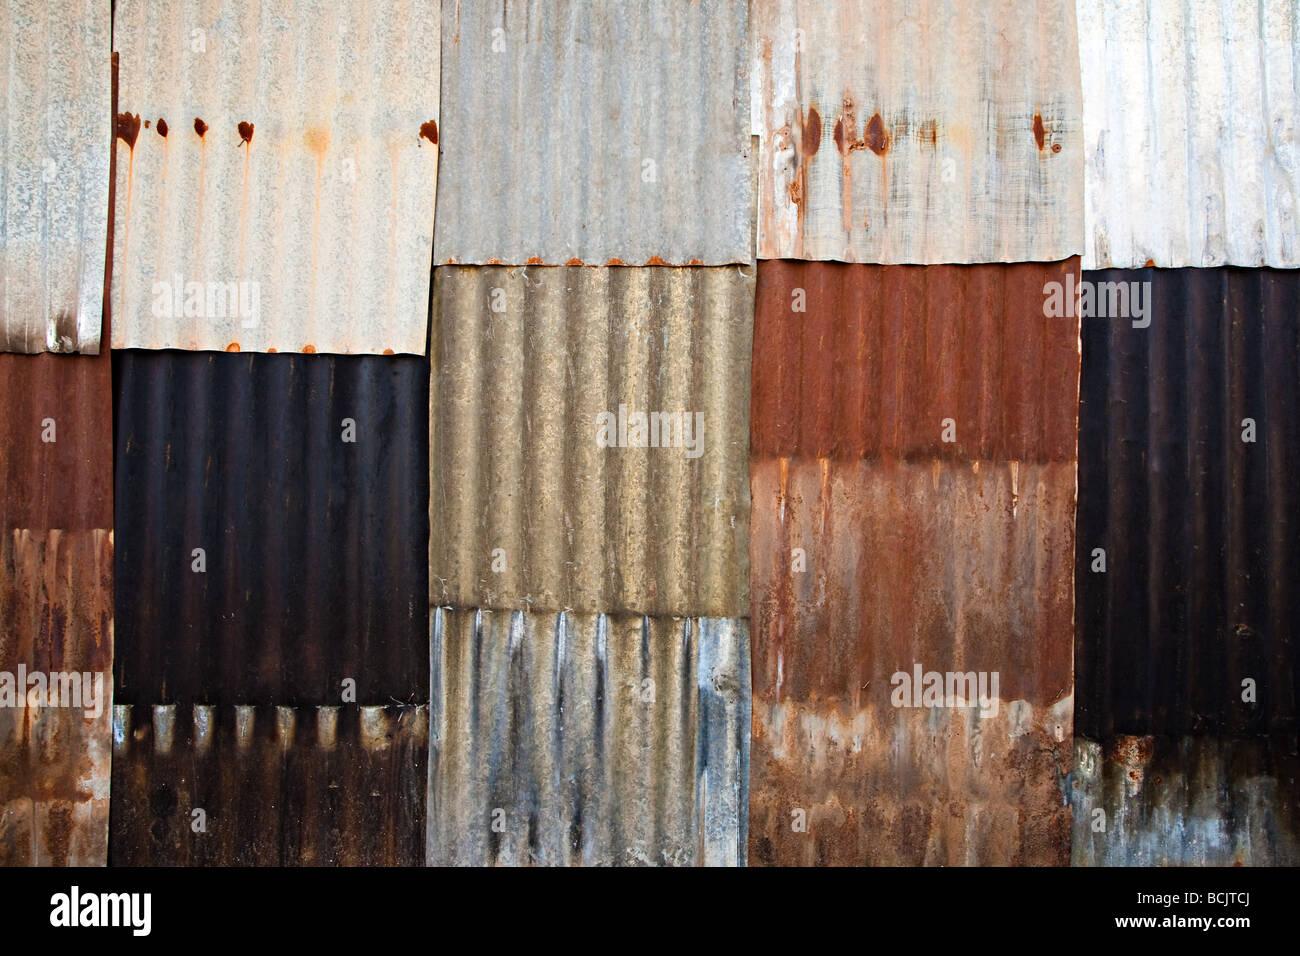 Corrugated iron wall - Stock Image